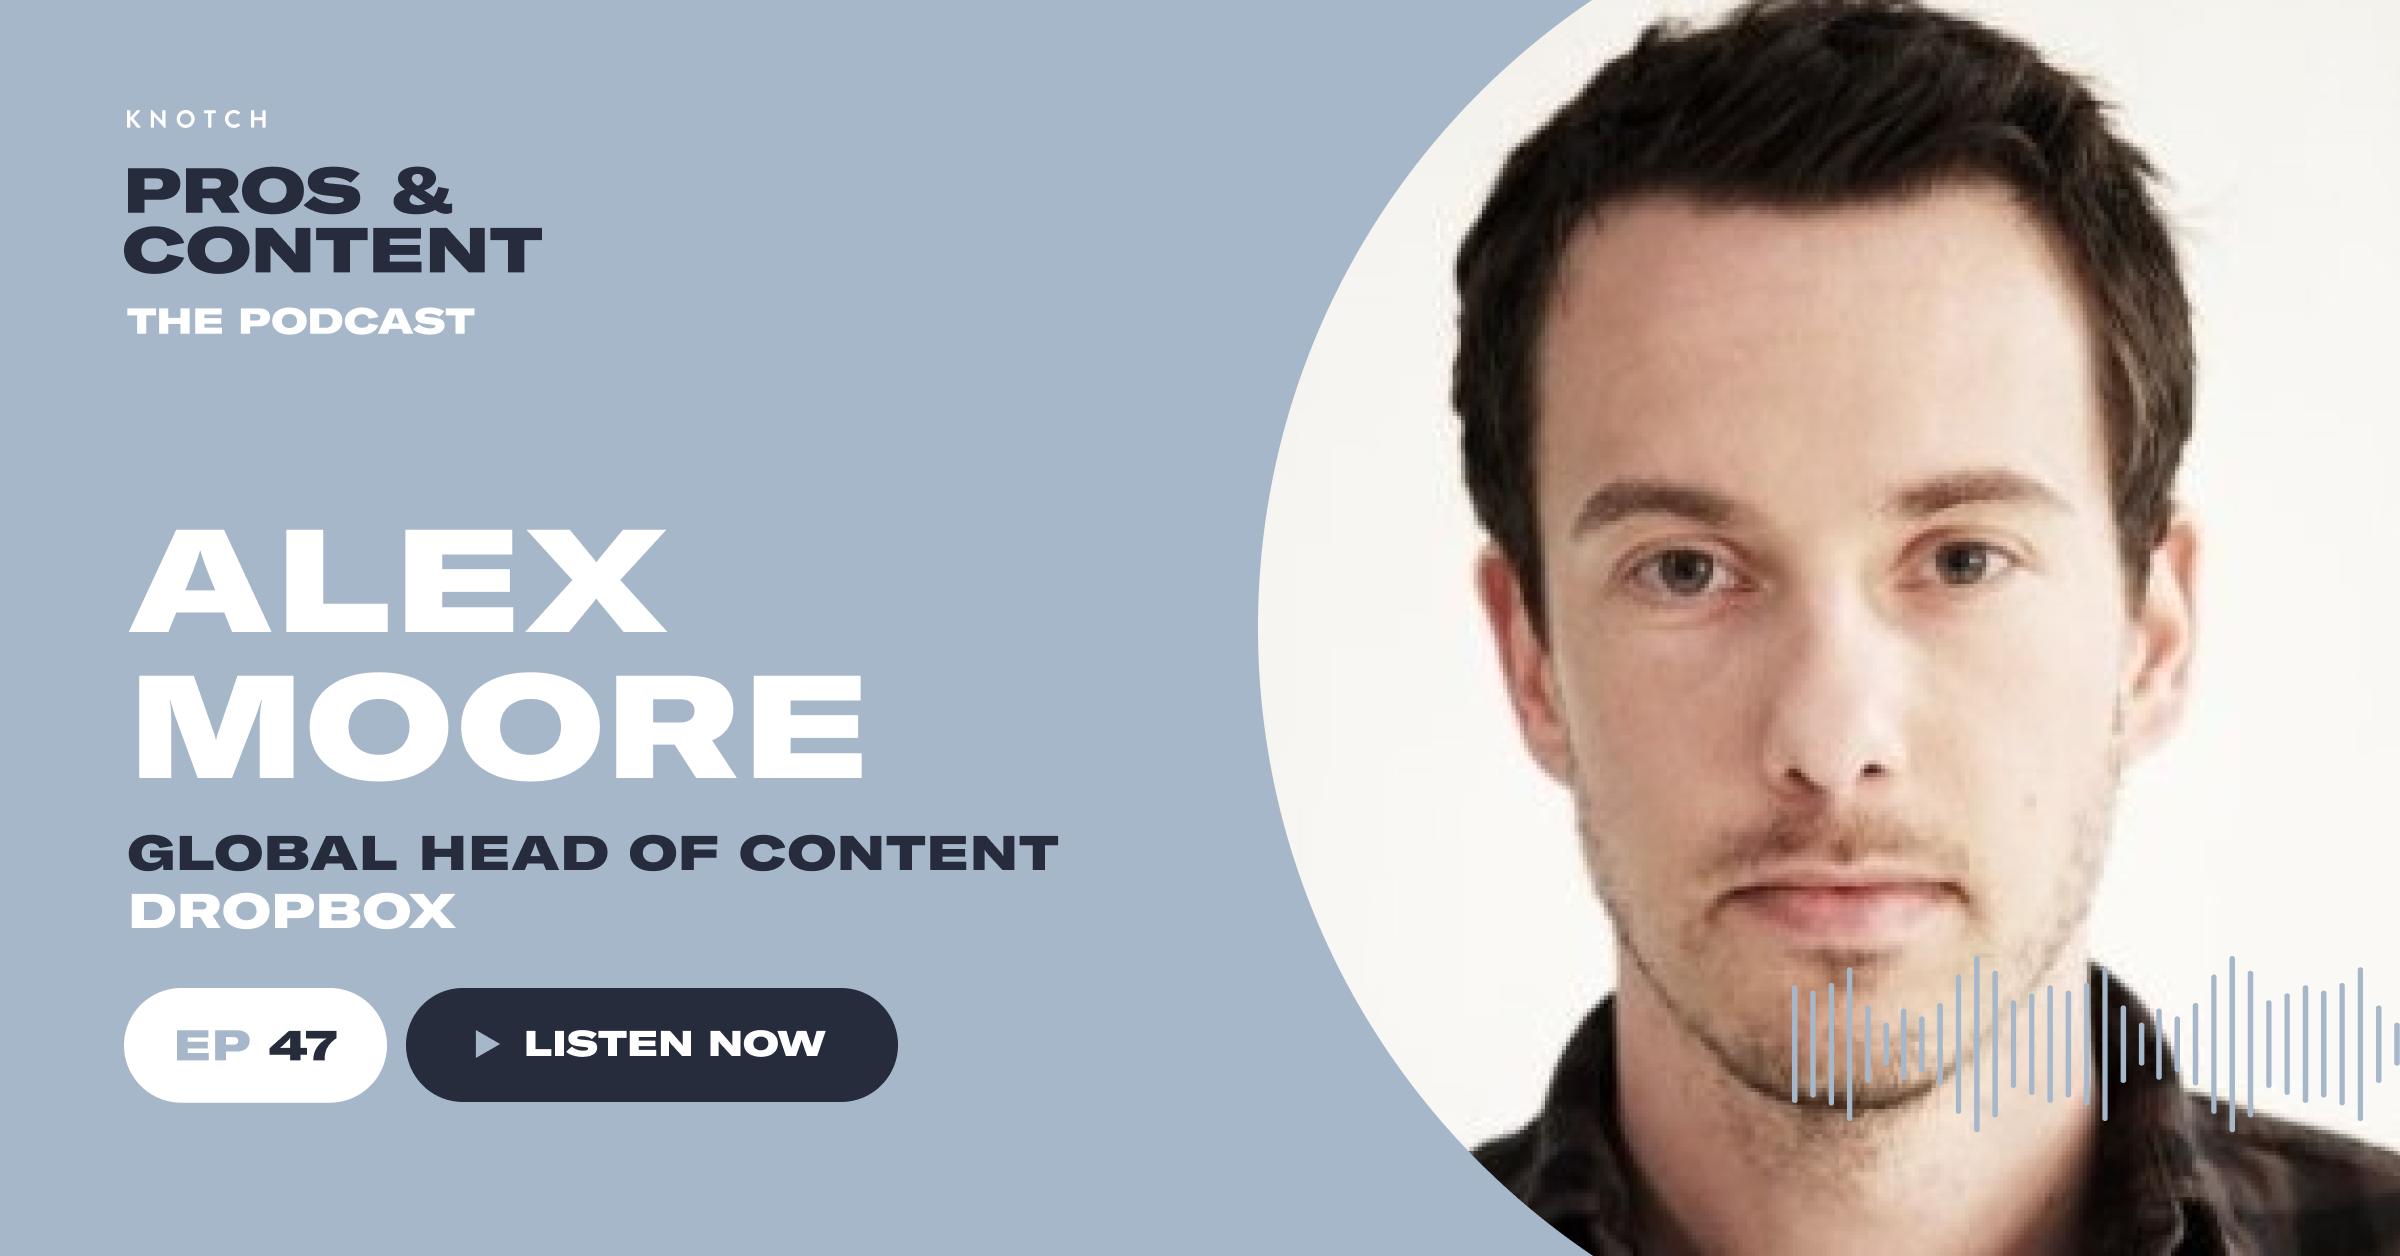 Pros & Content Podcast: Alex Moore